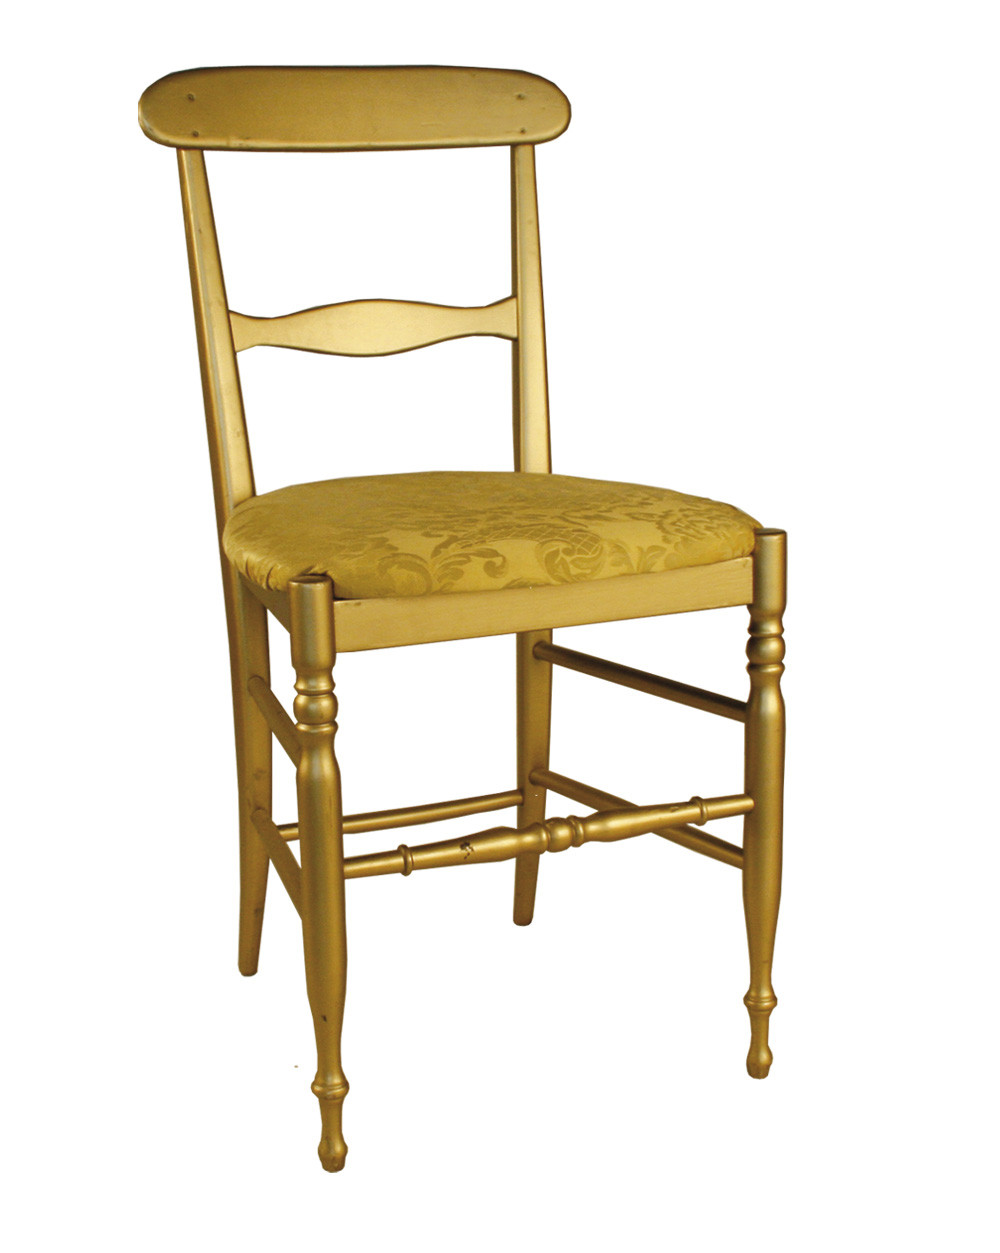 Noleggio sedie sedie mod campanina oro for Outlet sedie roma